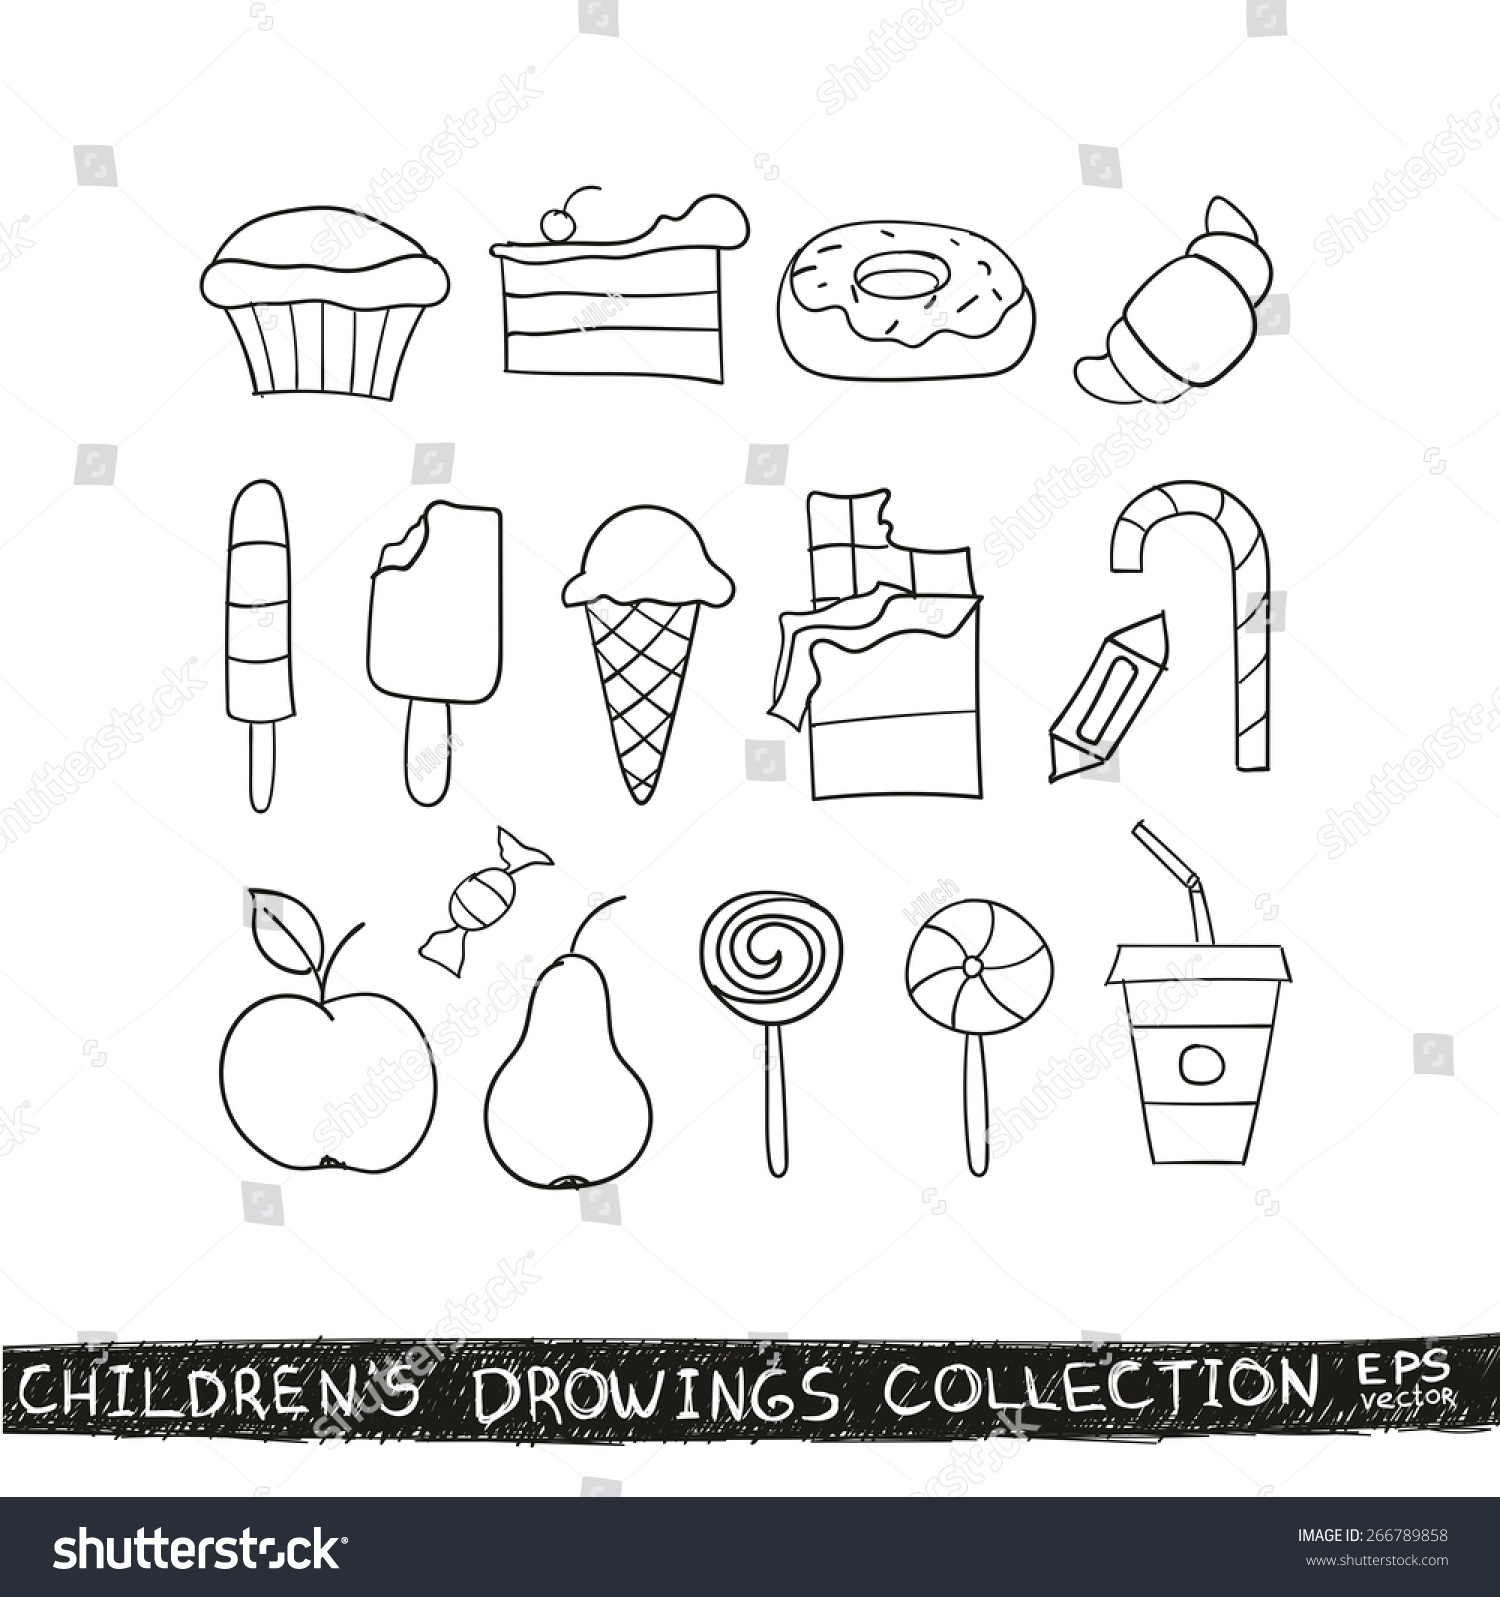 kid hand drawing tasty food collection line sketch illustration of child vector doodles set - Drawing Sketch For Kids